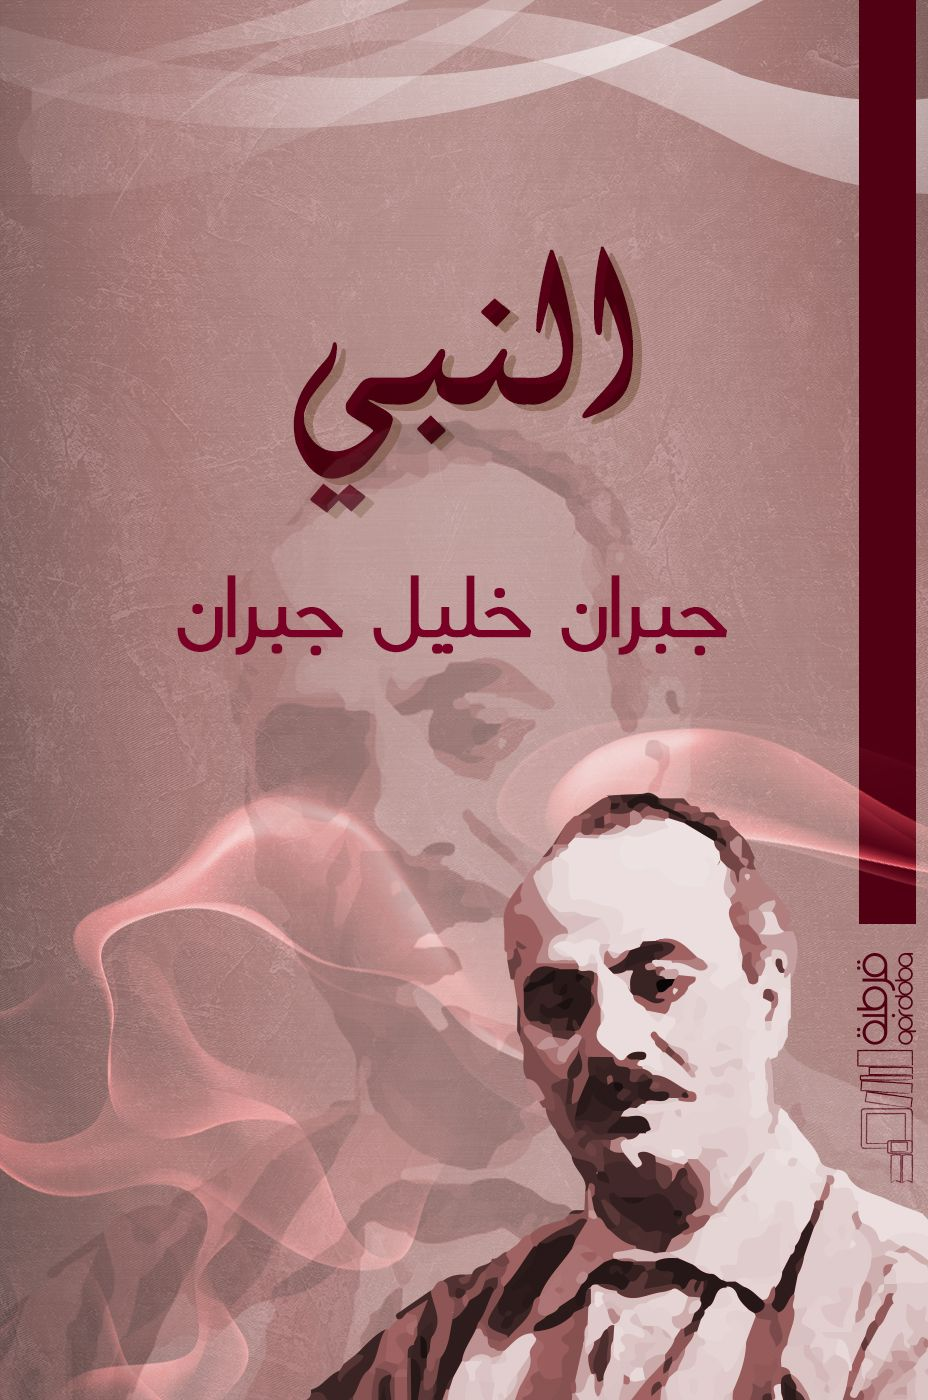 رواية النبي جبران خليل جبران pdf